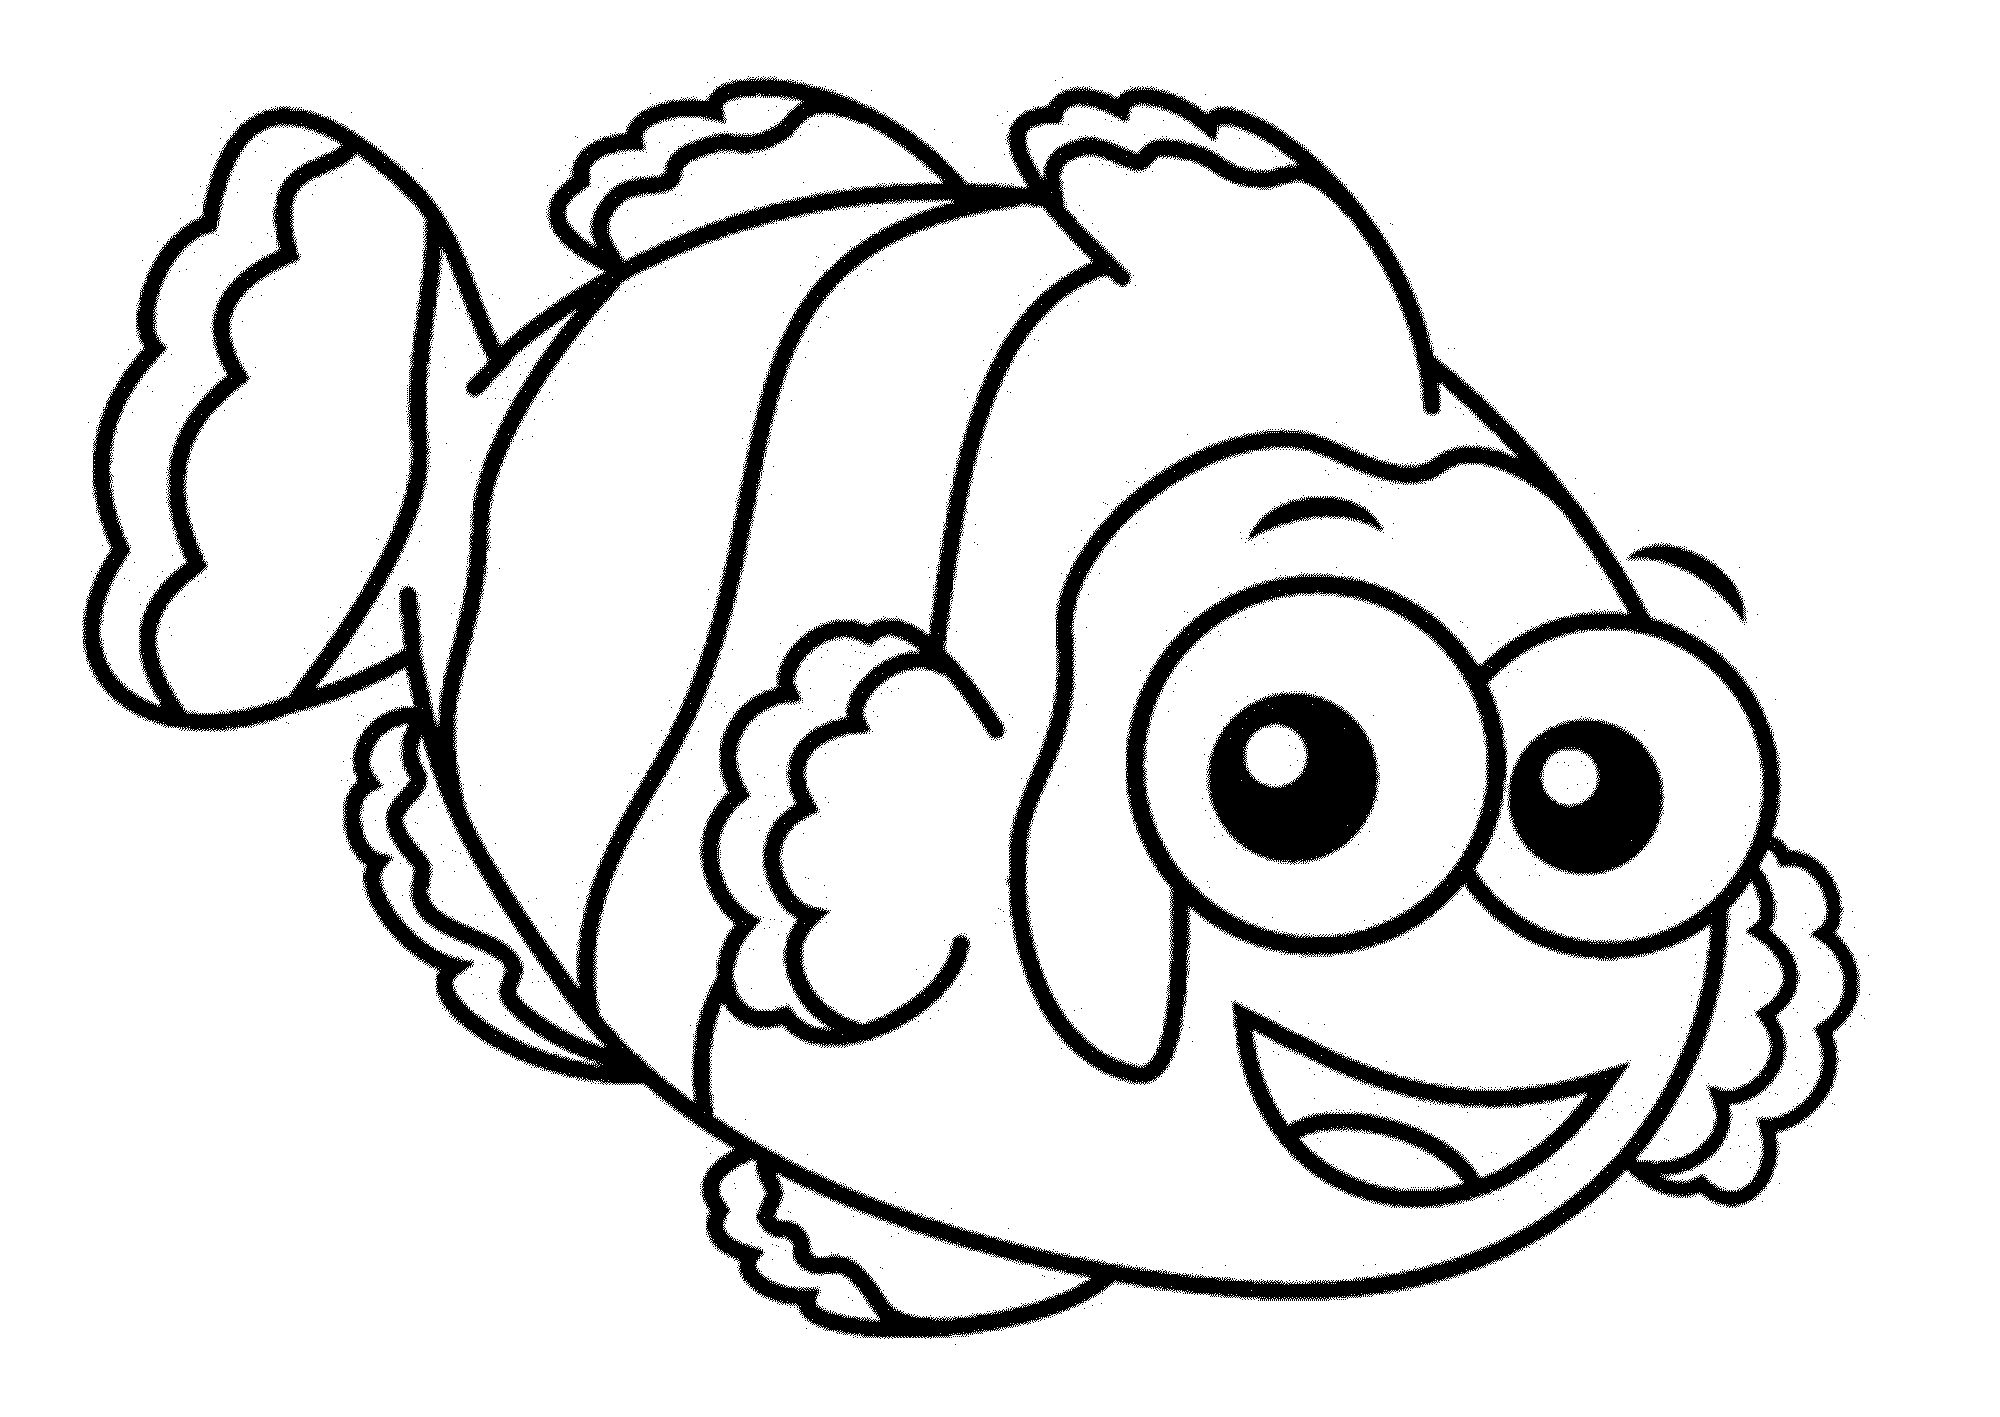 fish printable print download cute and educative fish coloring pages fish printable 1 1